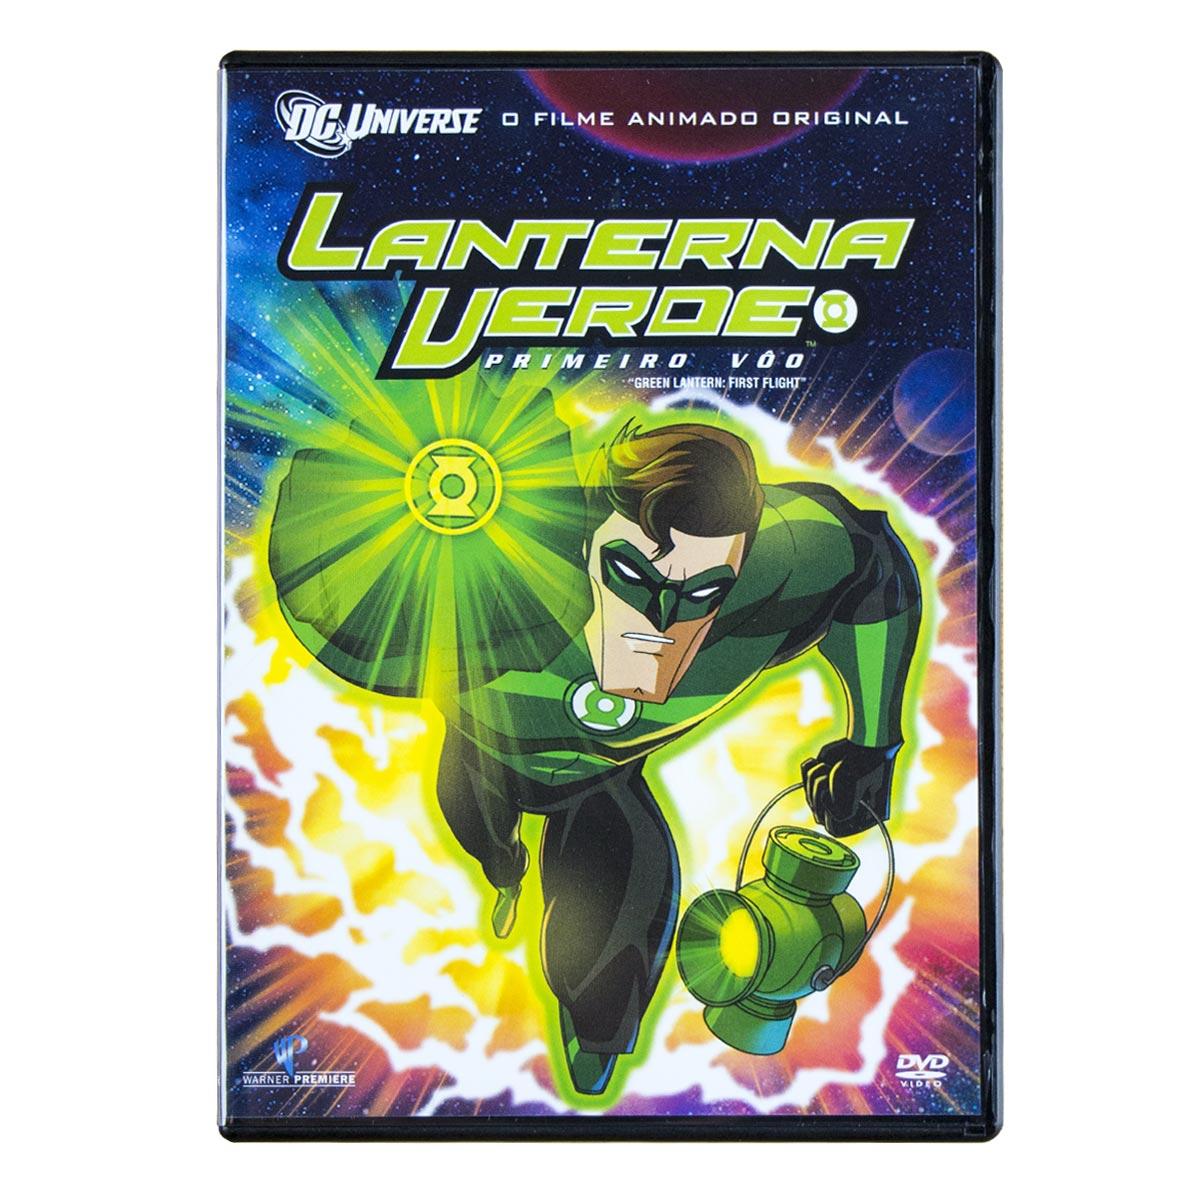 DVD Lanterna Verde Primeiro Vôo